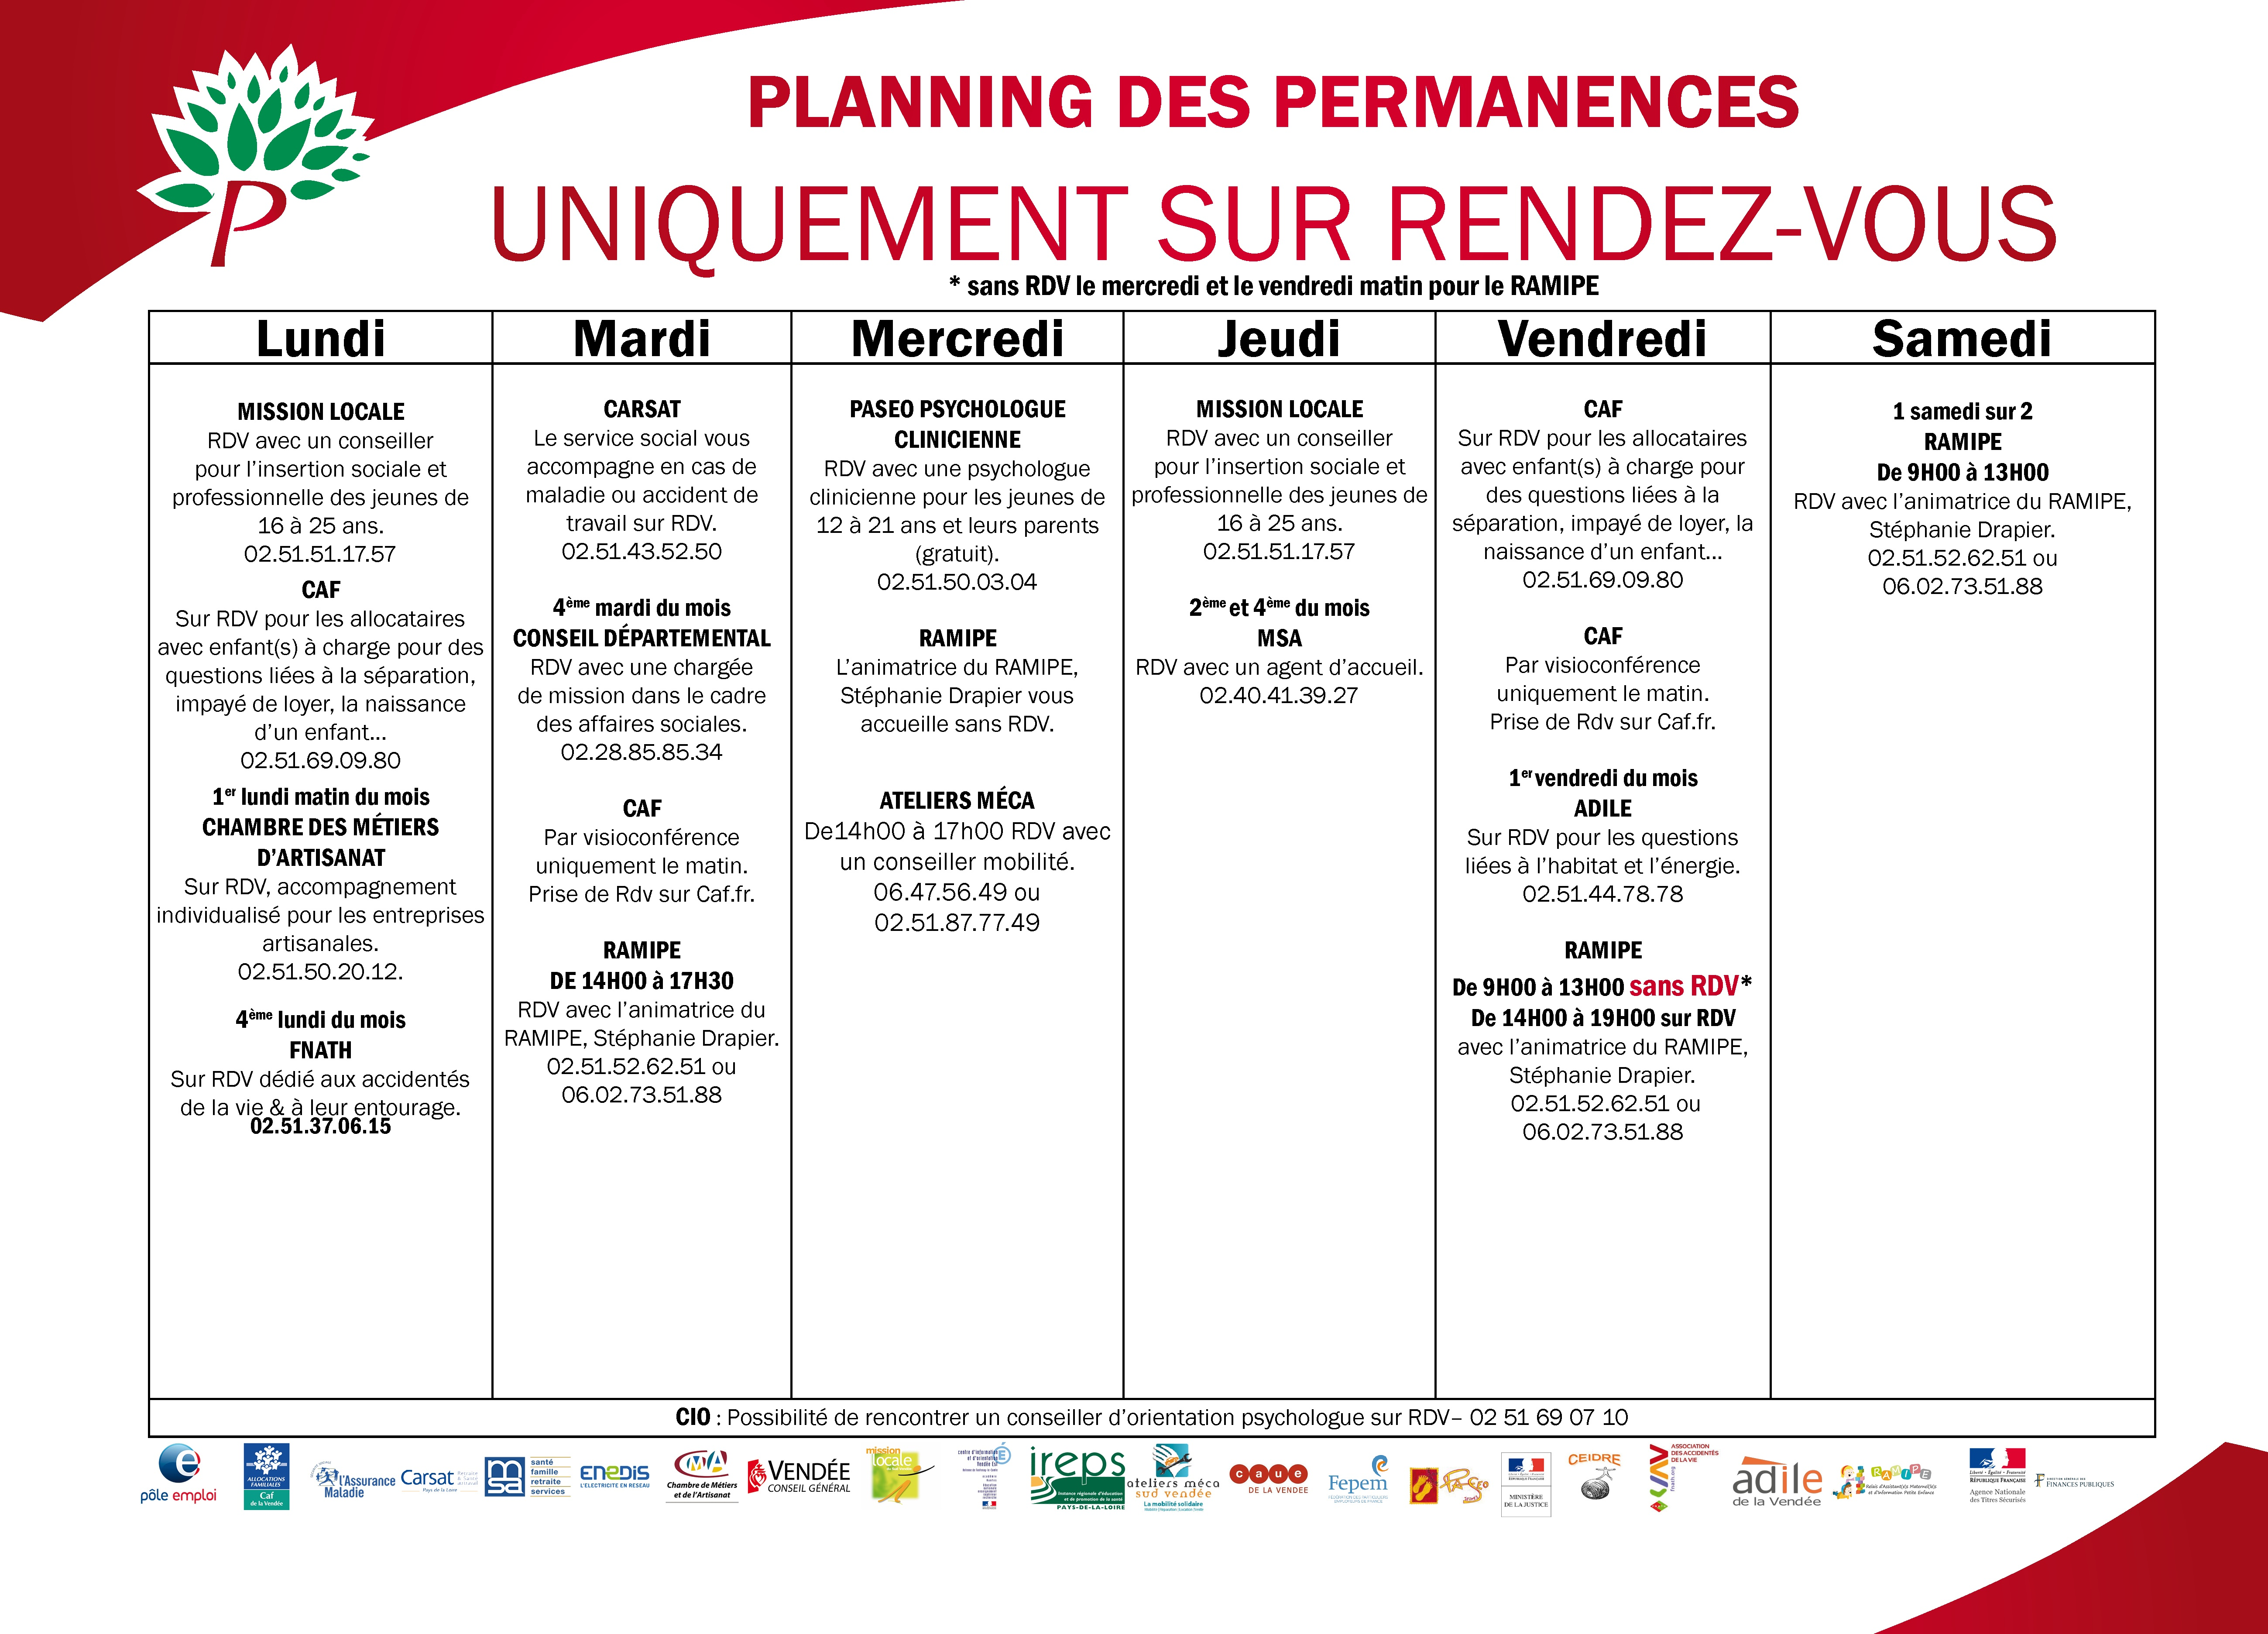 Planning des Permanences MSAP.jpg